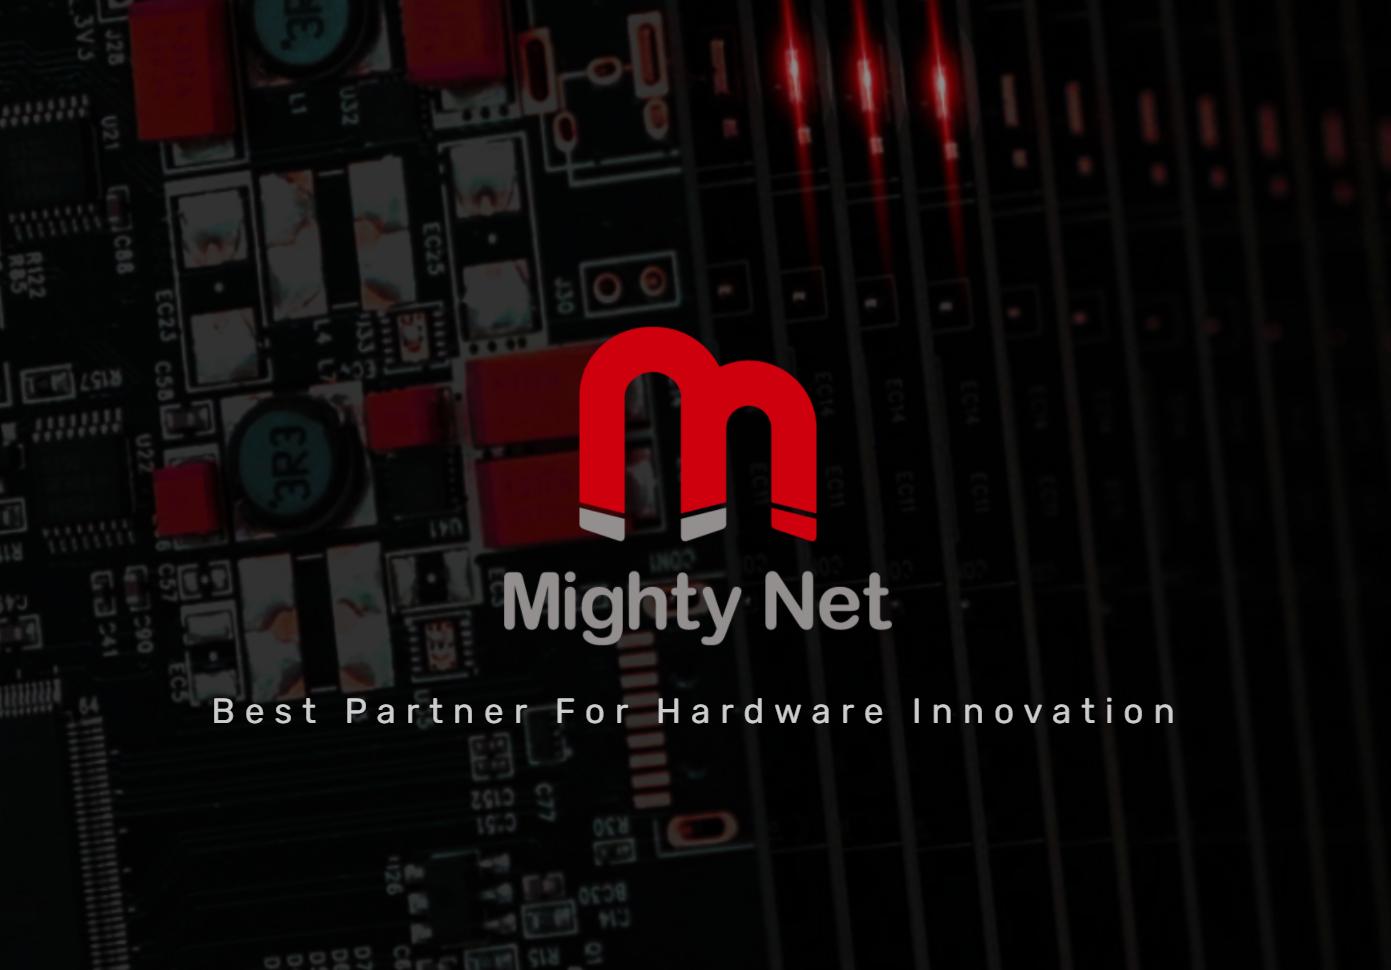 MightyNet螢幕截圖 2020-10-16 10.06.54